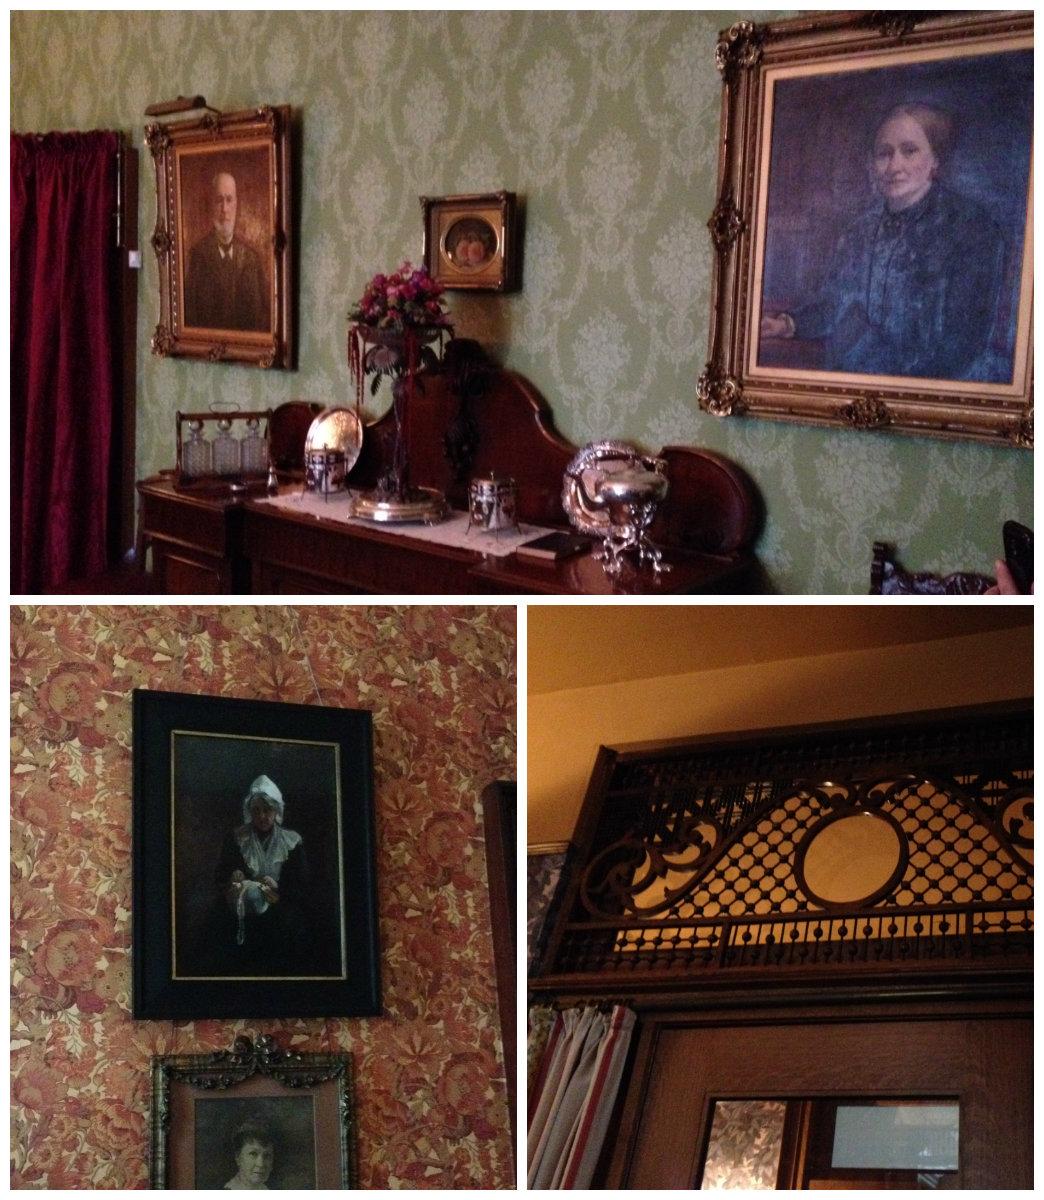 Family Portraits of the Austin Family